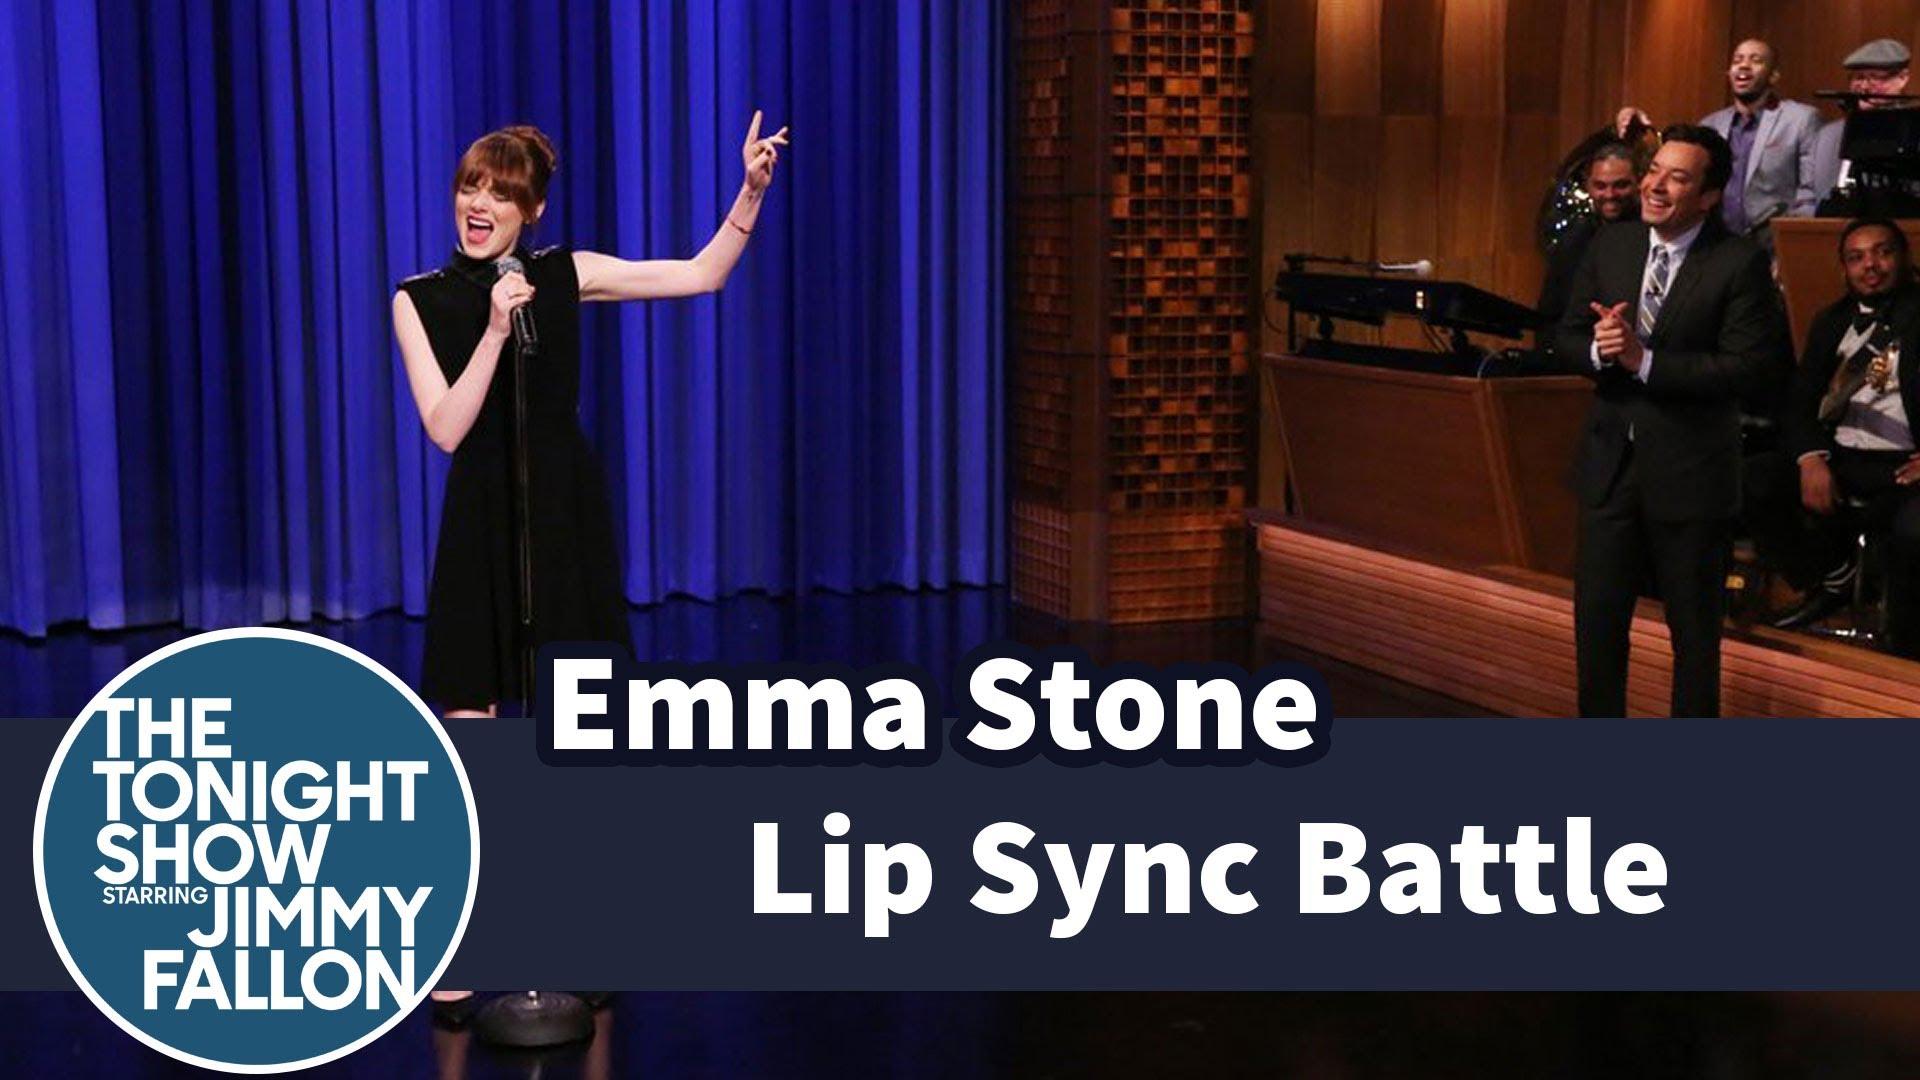 emma stone jimmy fallon lip sync battle hot girls wallpaper